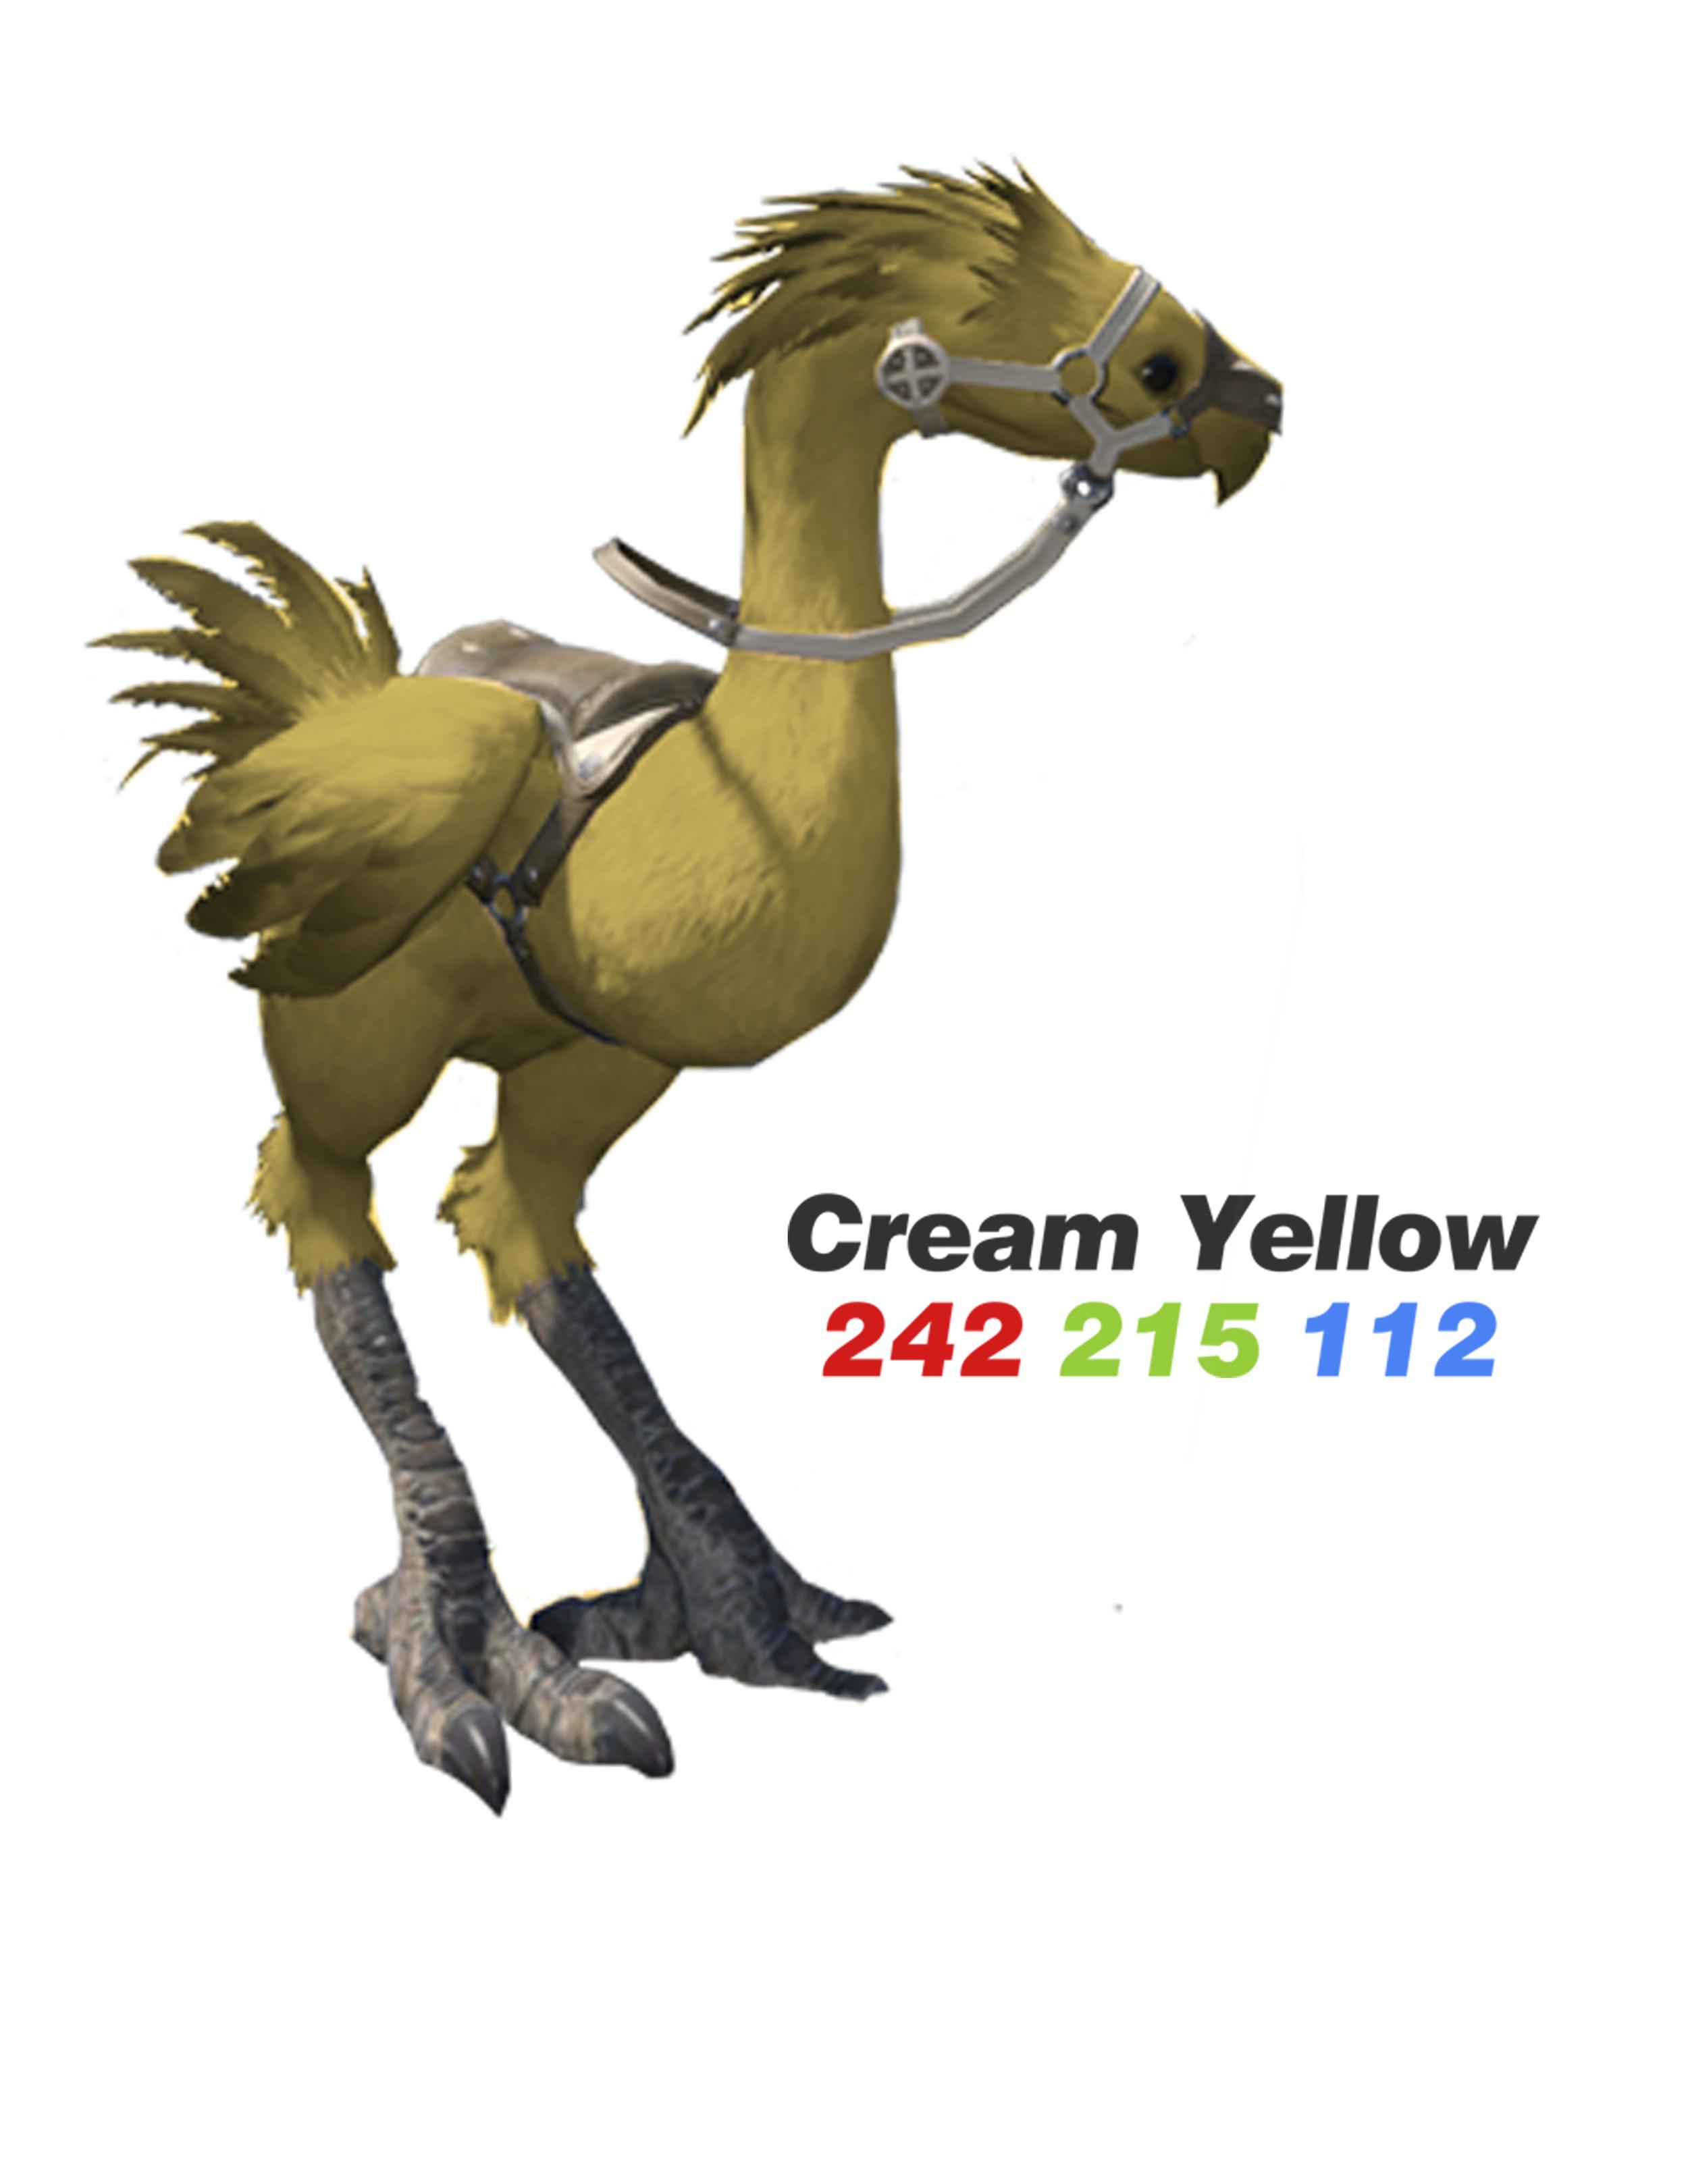 CreamYellow.png